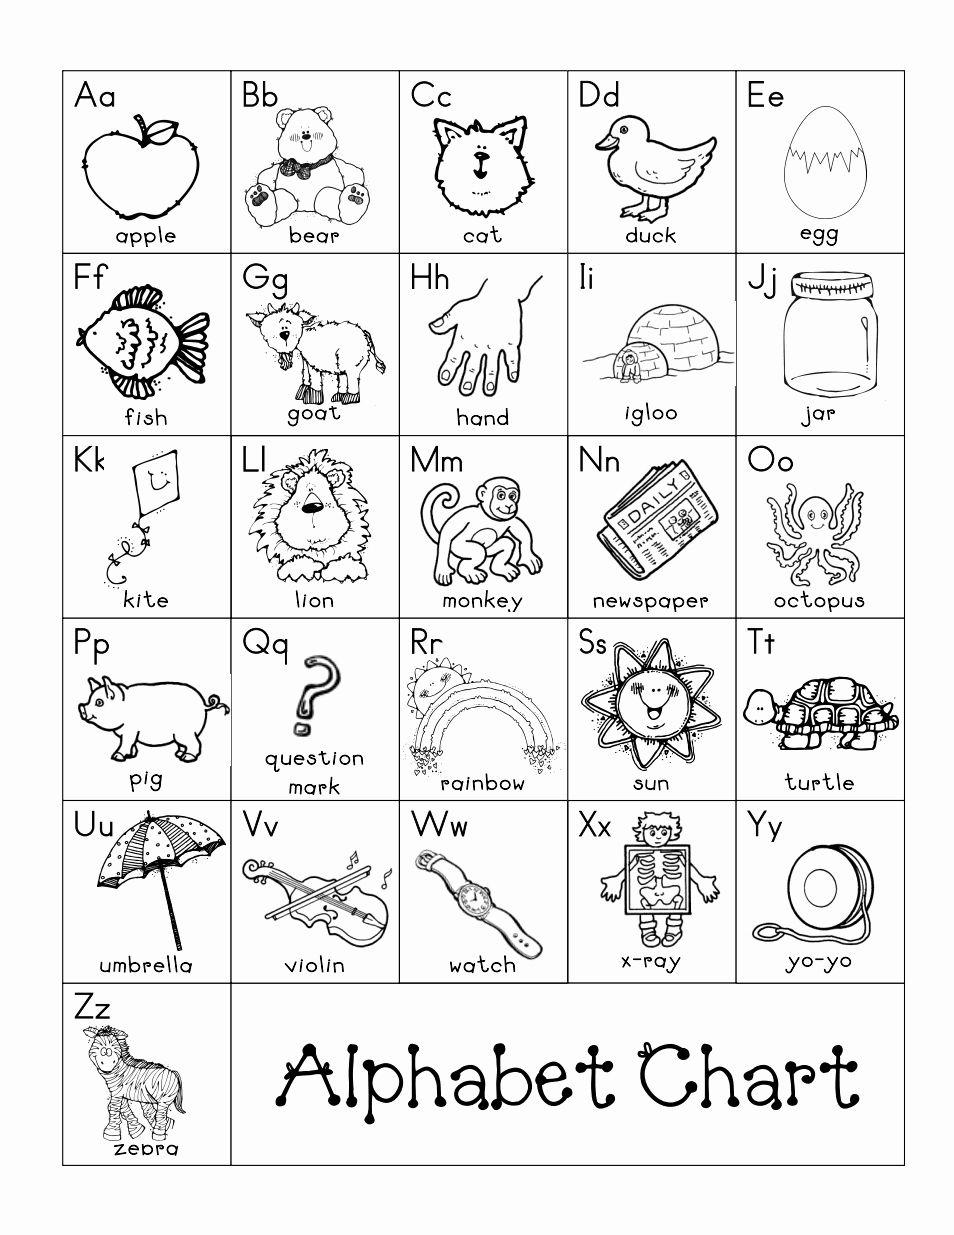 Alphabet Coloring Sheets Az Pdf in 2020 Alphabet charts